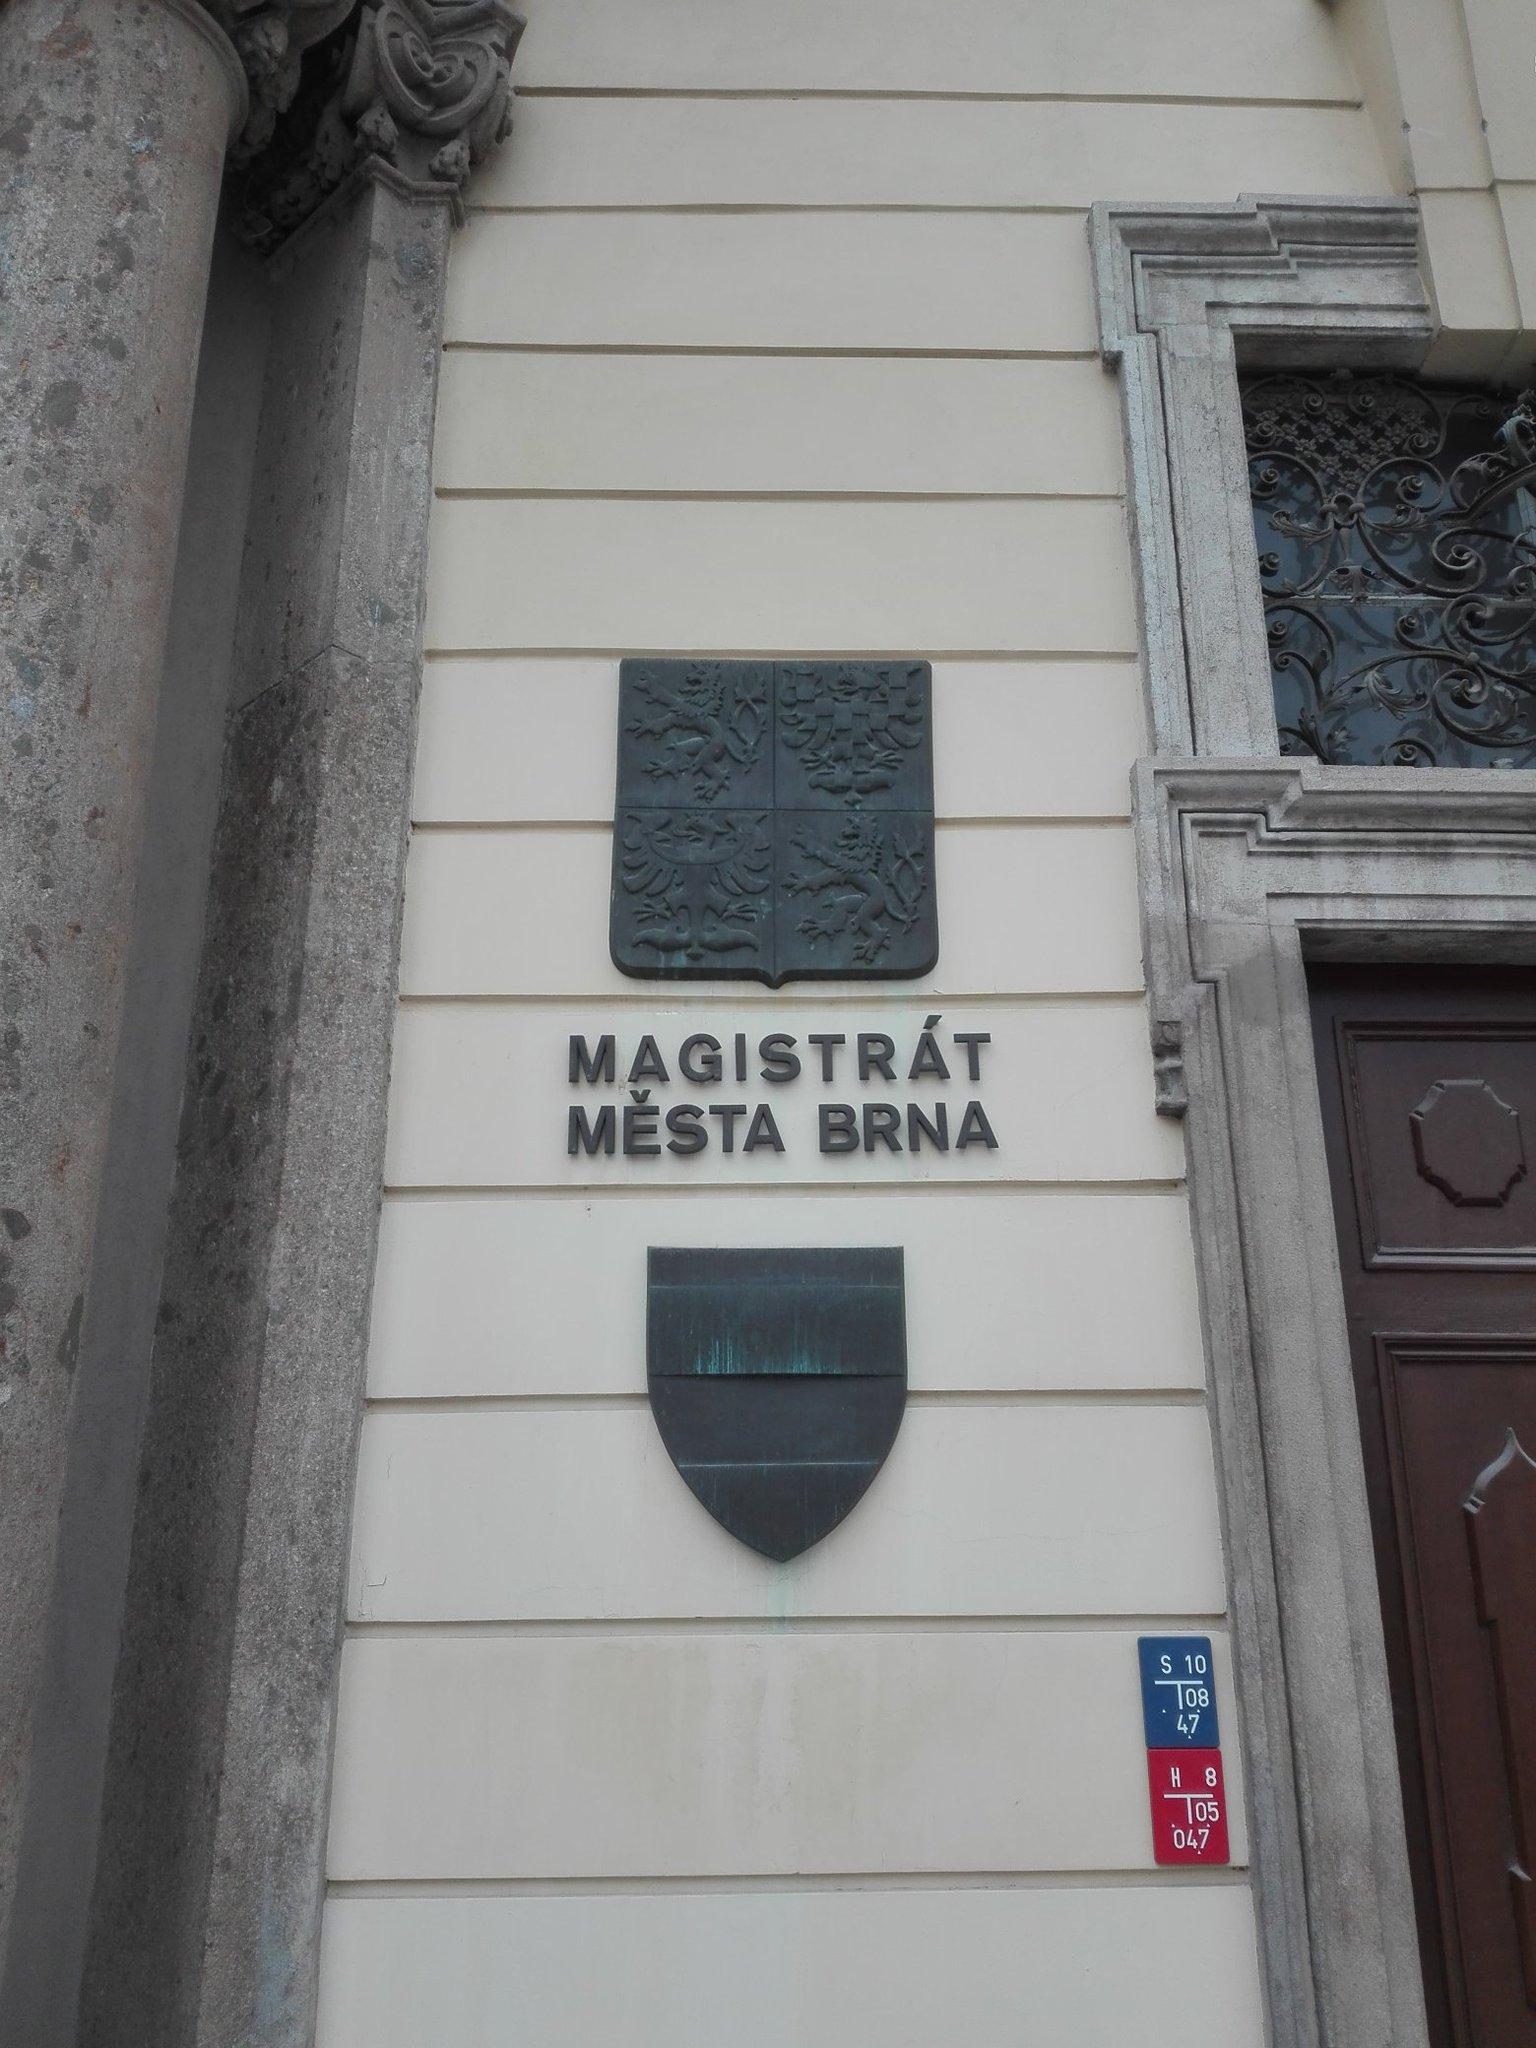 Magistrát města Brna. Foto: Patrik Švec